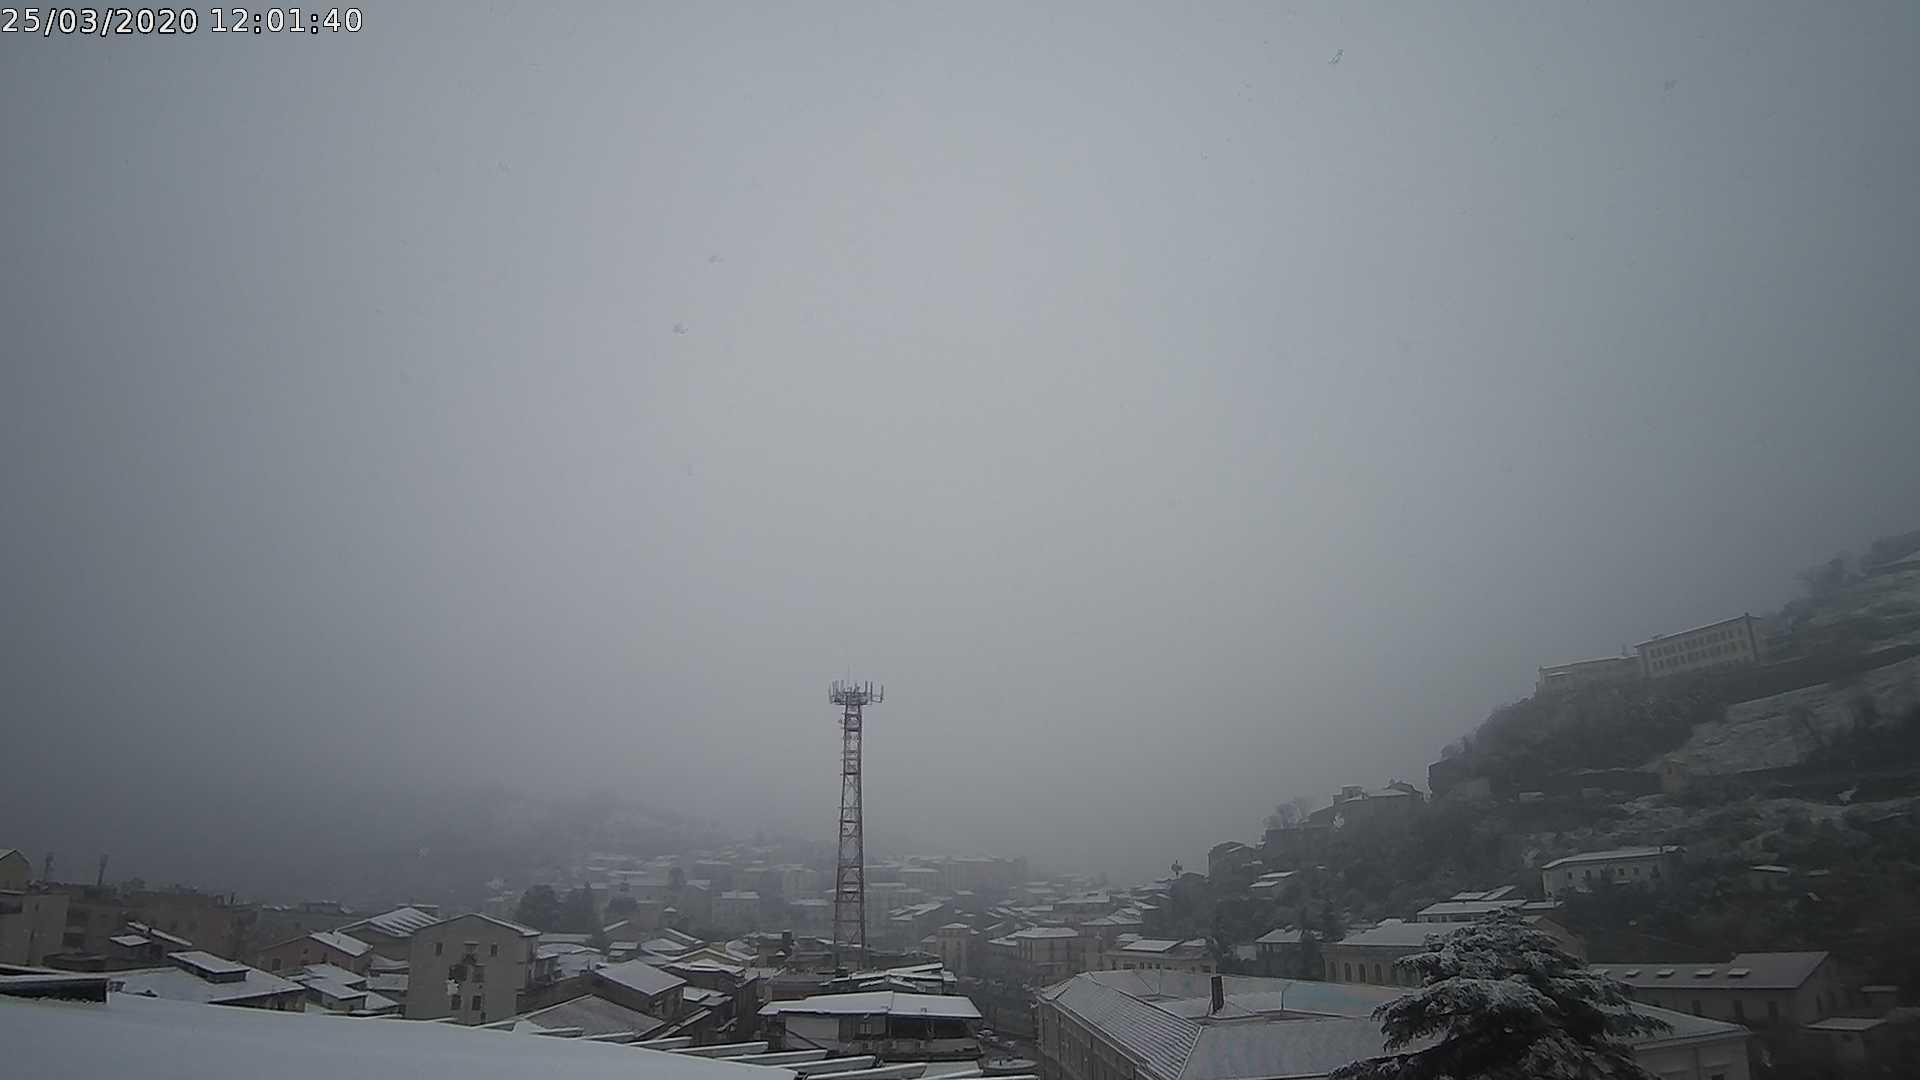 Cosenza neve 25 marzo 2020